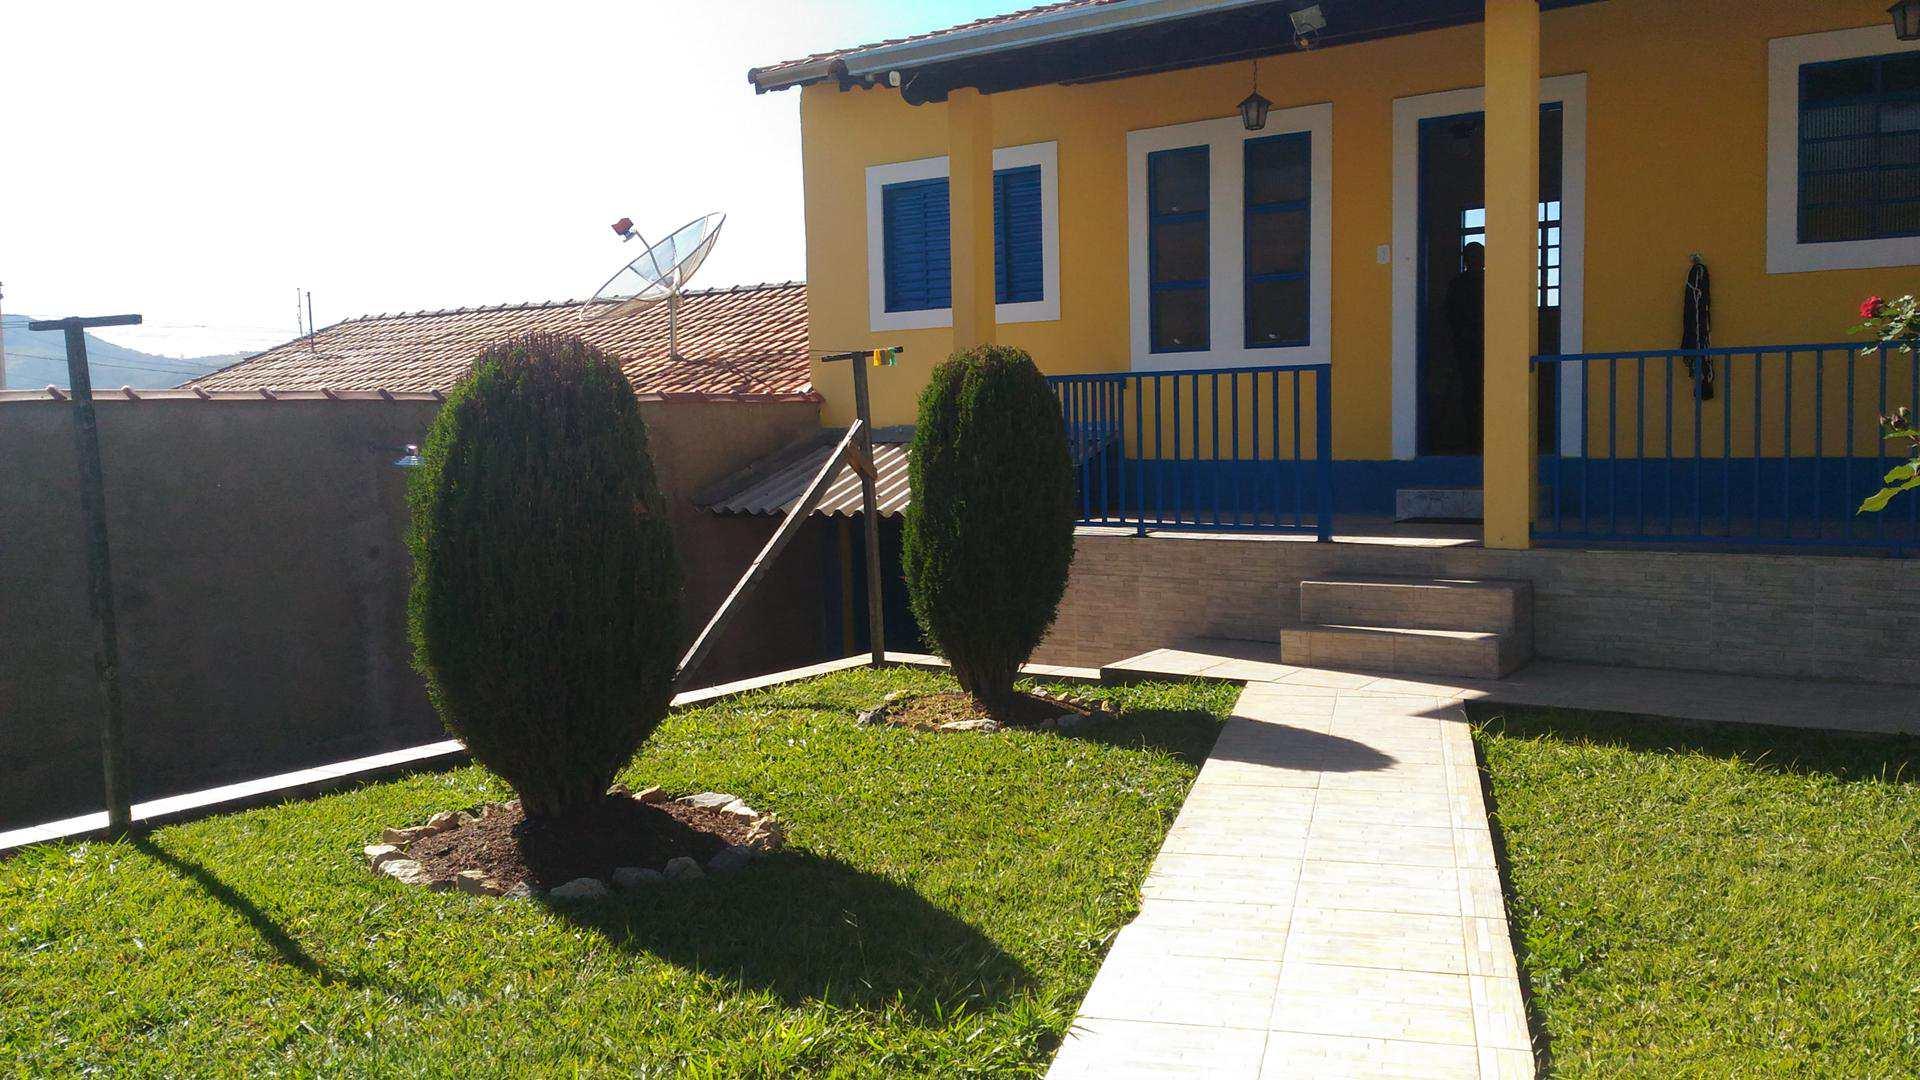 Casa com 2 dorms, sao benedito, Santa Rita do Sapucaí - R$ 160 mil, Cod: 189